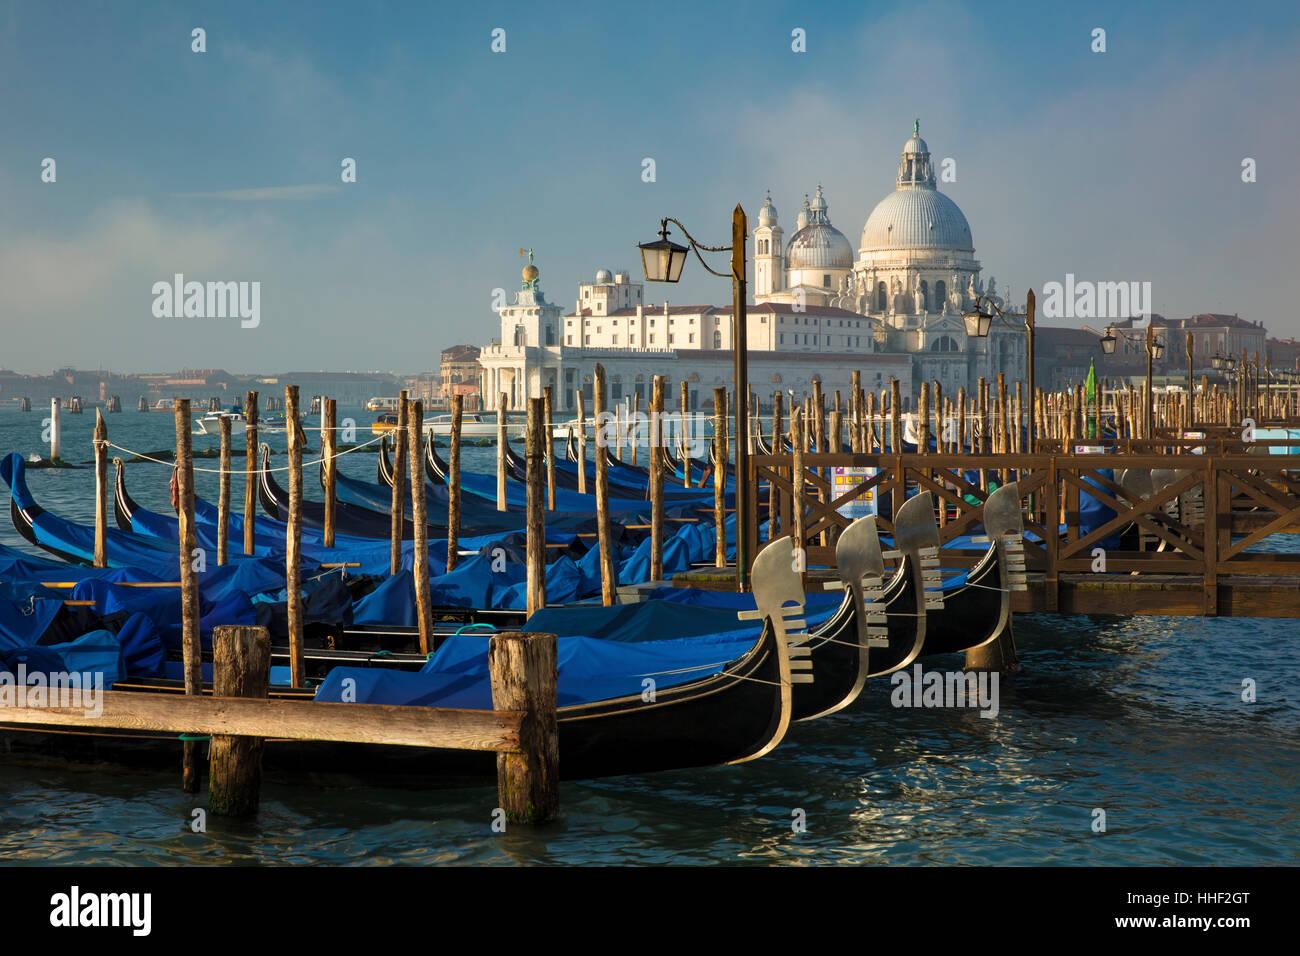 Góndolas flotando debajo de Santa Maria della Salute, Venecia, Véneto, Italia Foto de stock